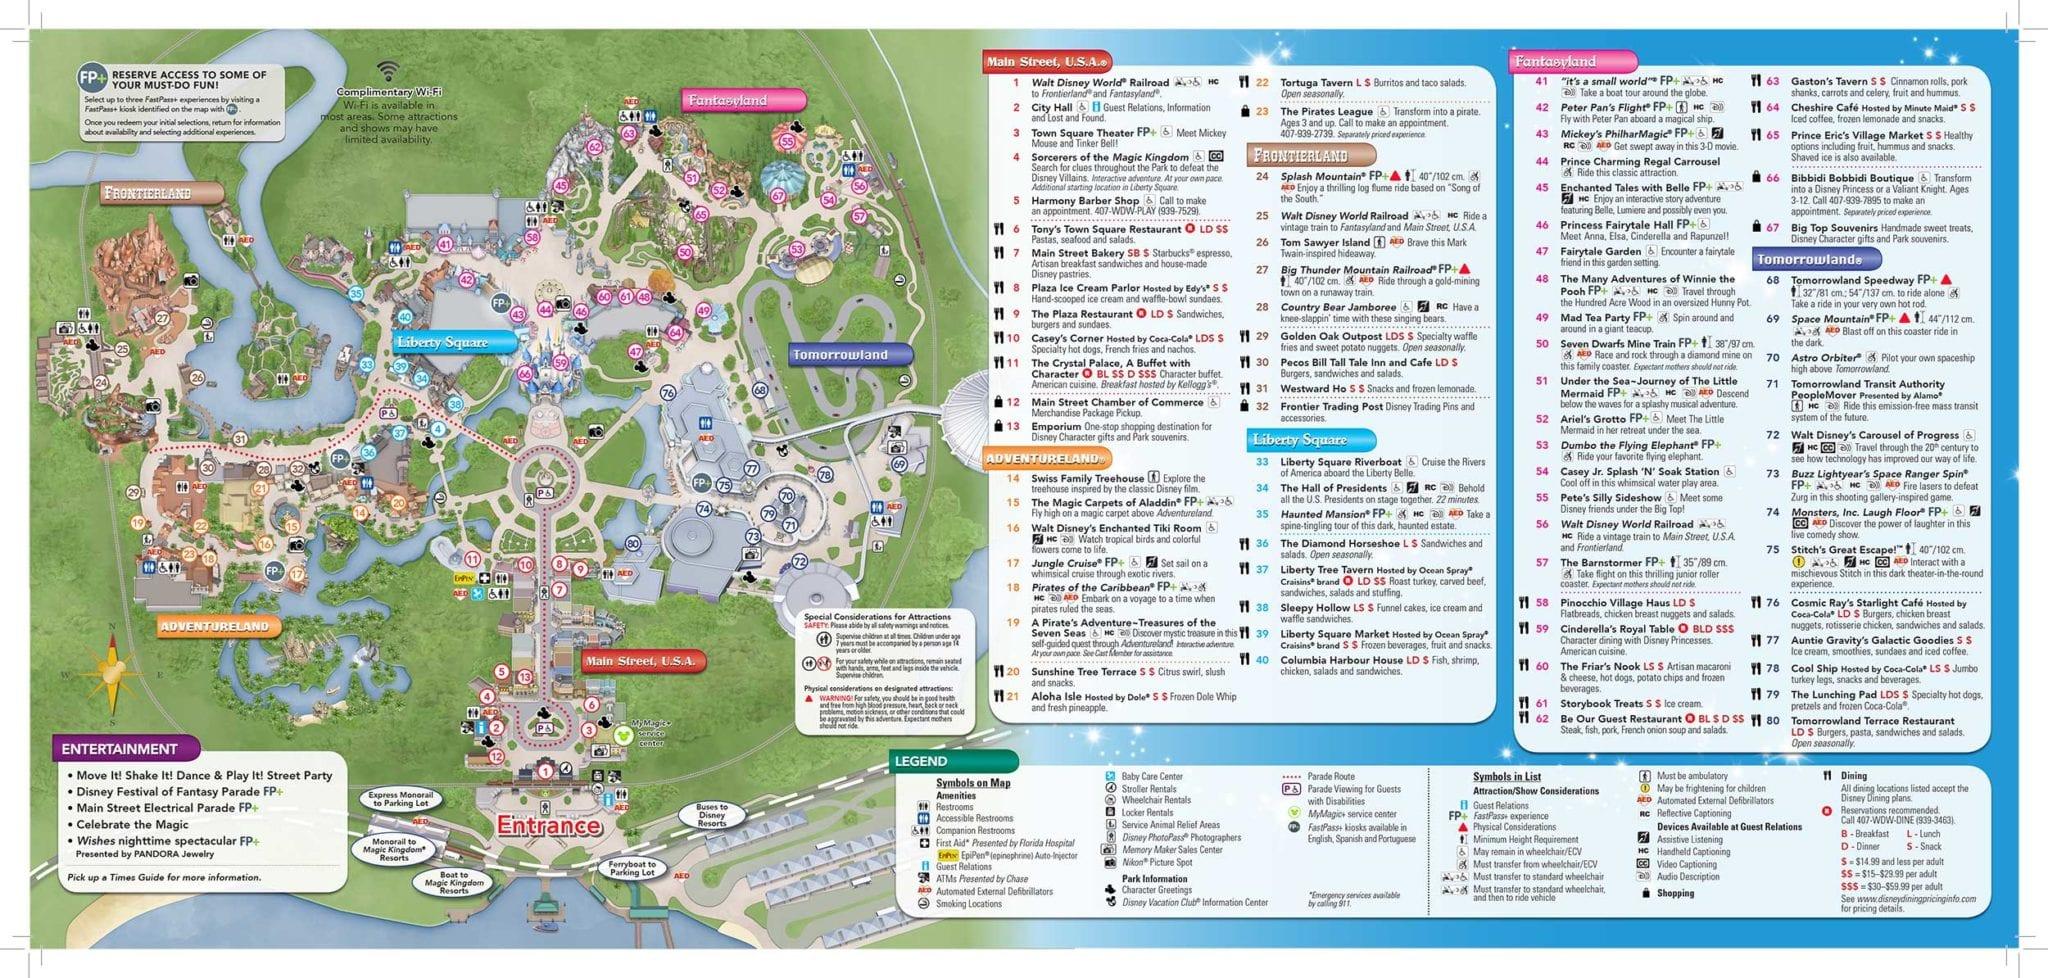 Disney magic kingdom map Kathryn Whitaker